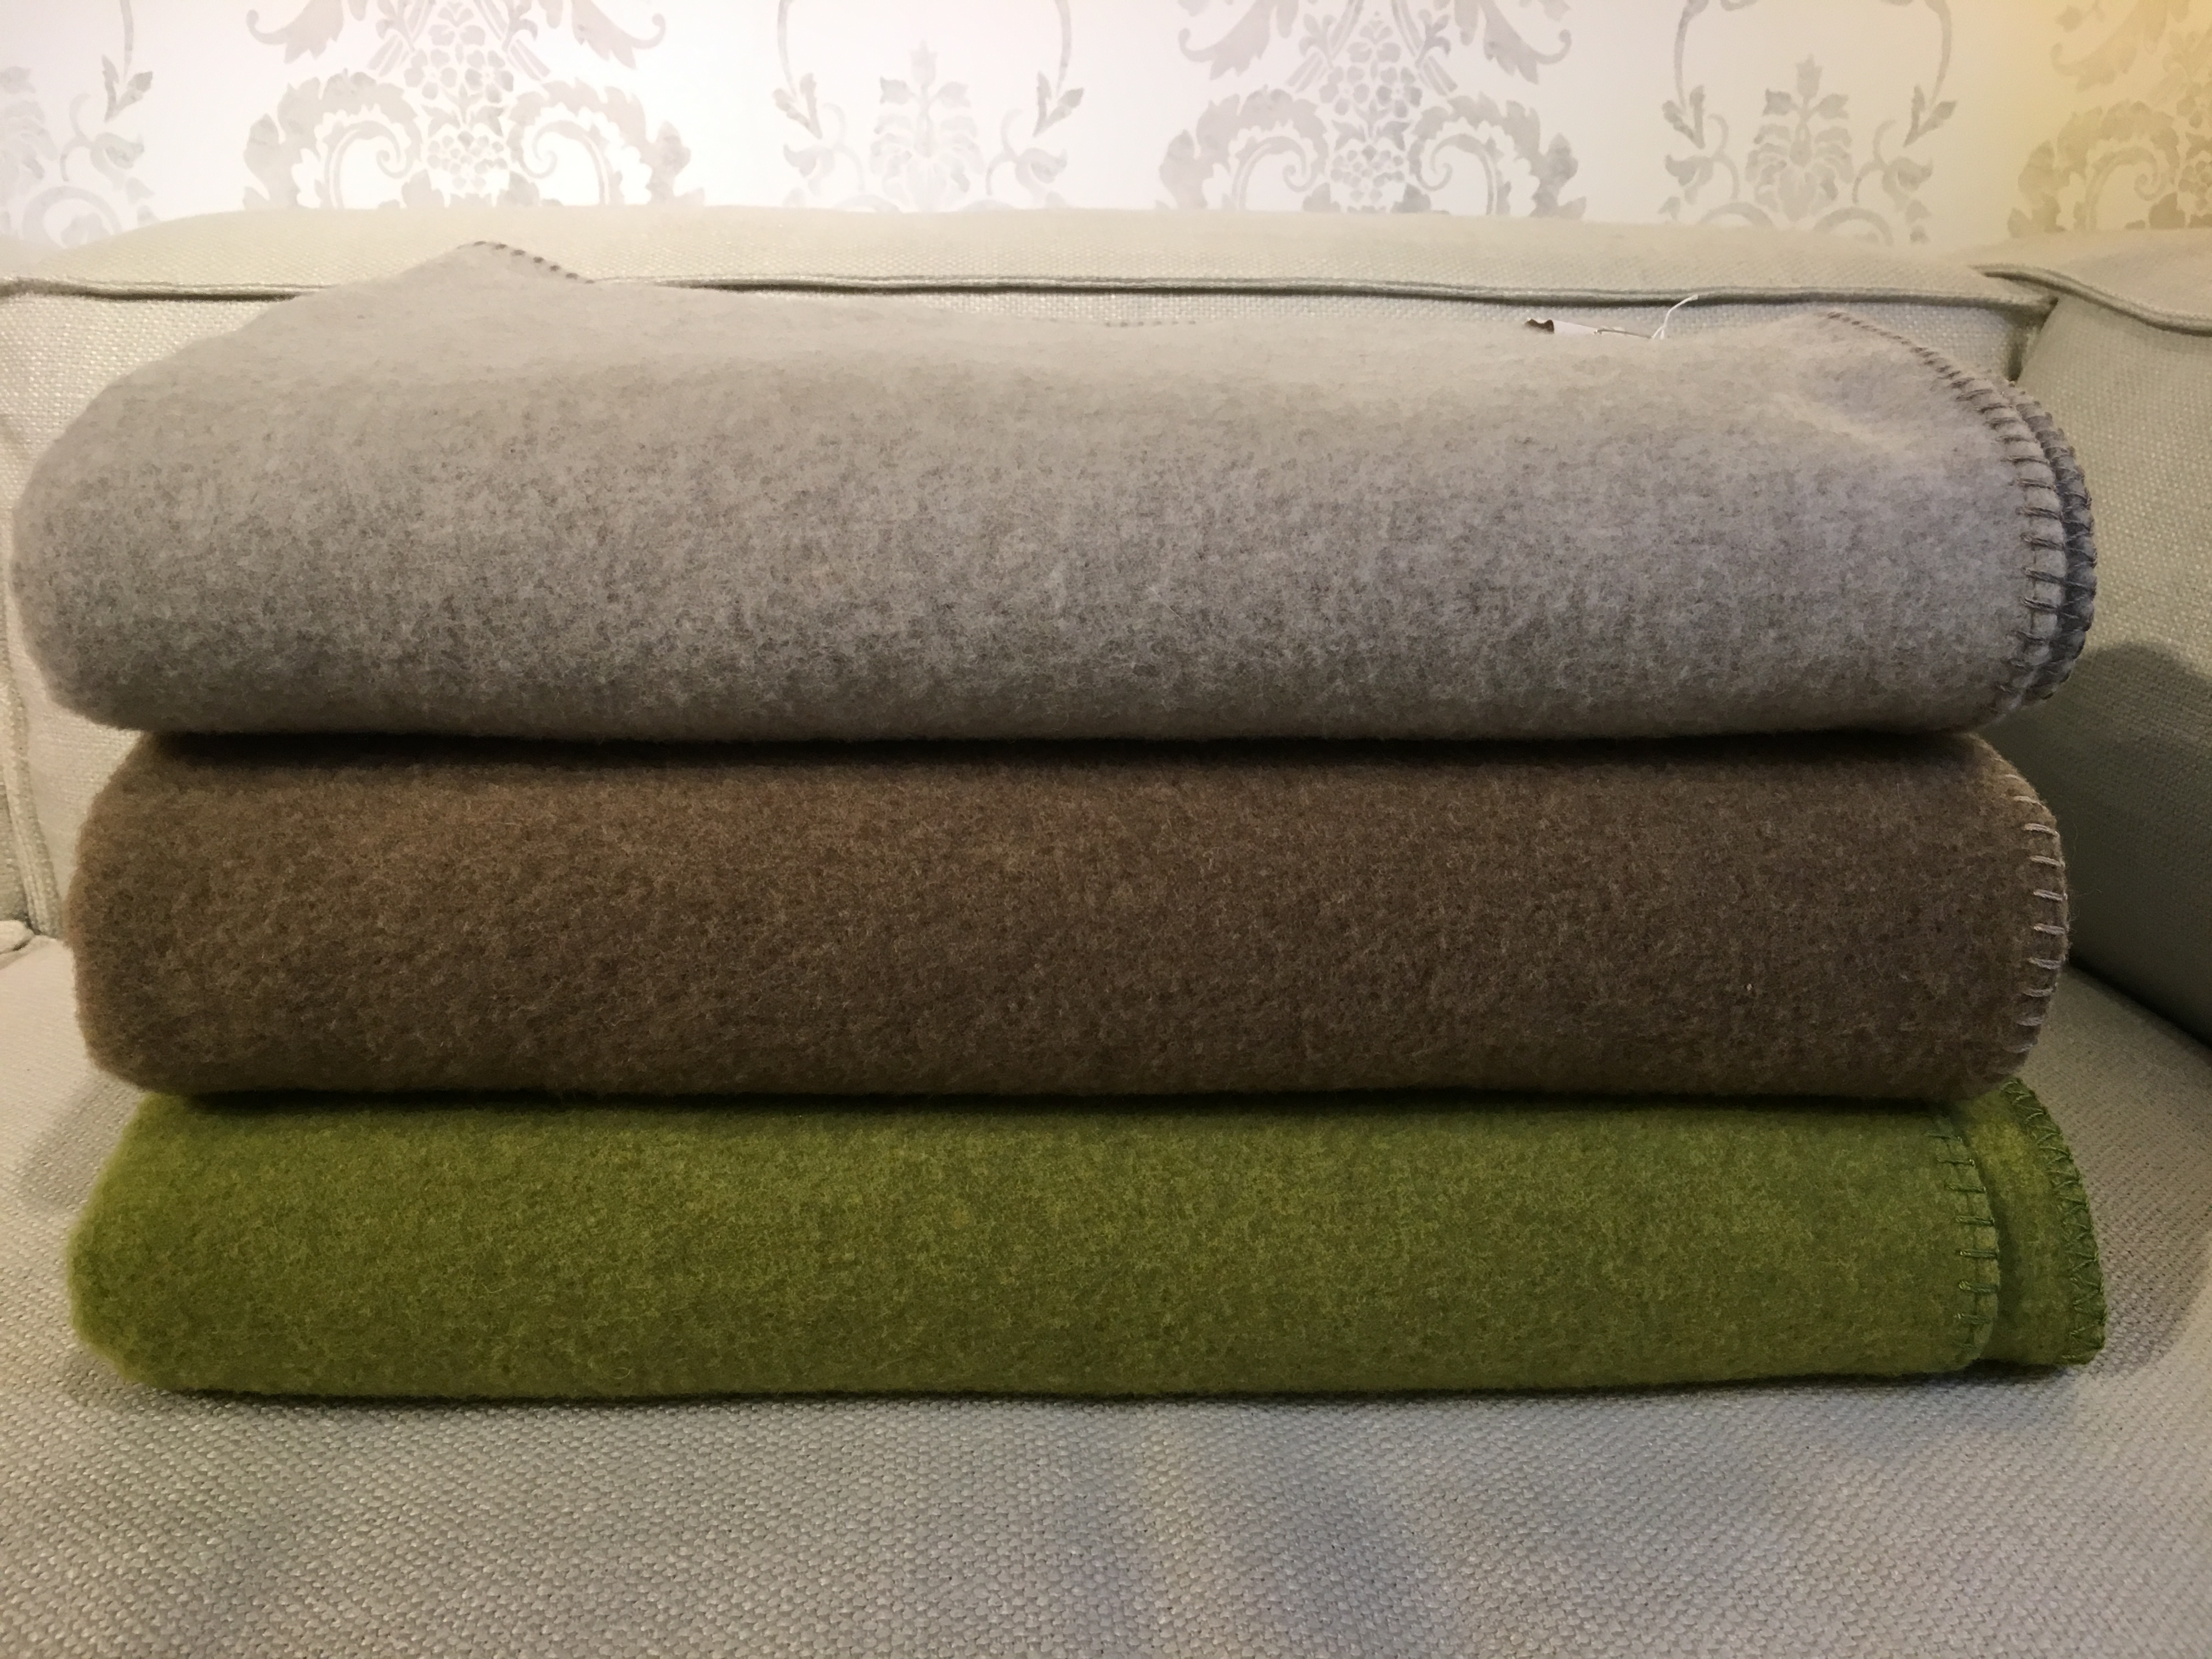 Decke Sophia aus 100% Merinowolle Farbe creme, schilf, farn